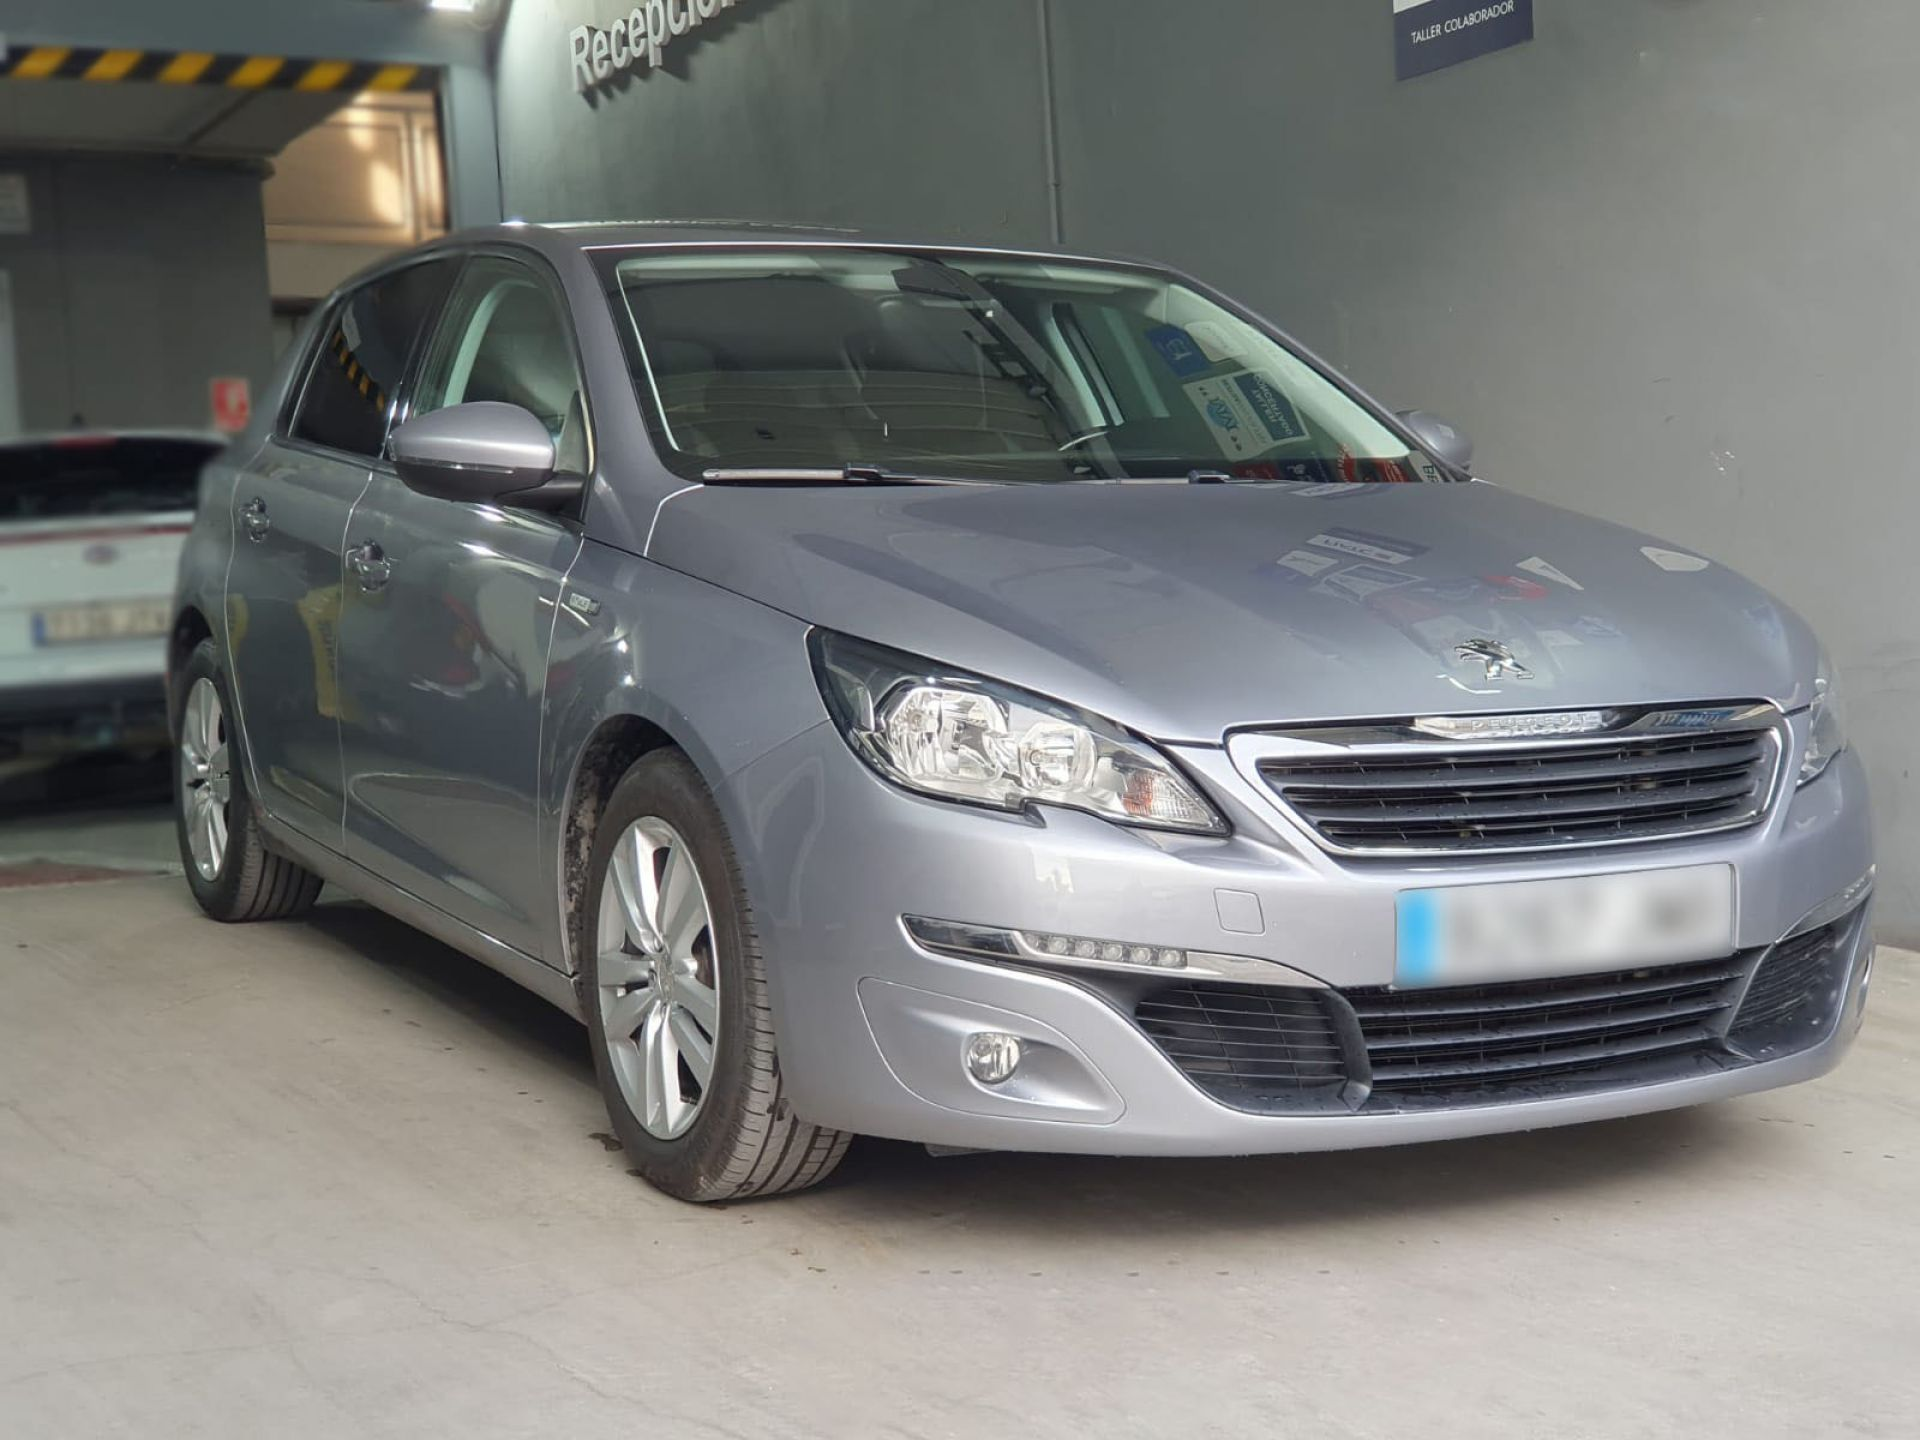 Peugeot 308 5p Style 1.6 BlueHDi 100 segunda mano Cádiz